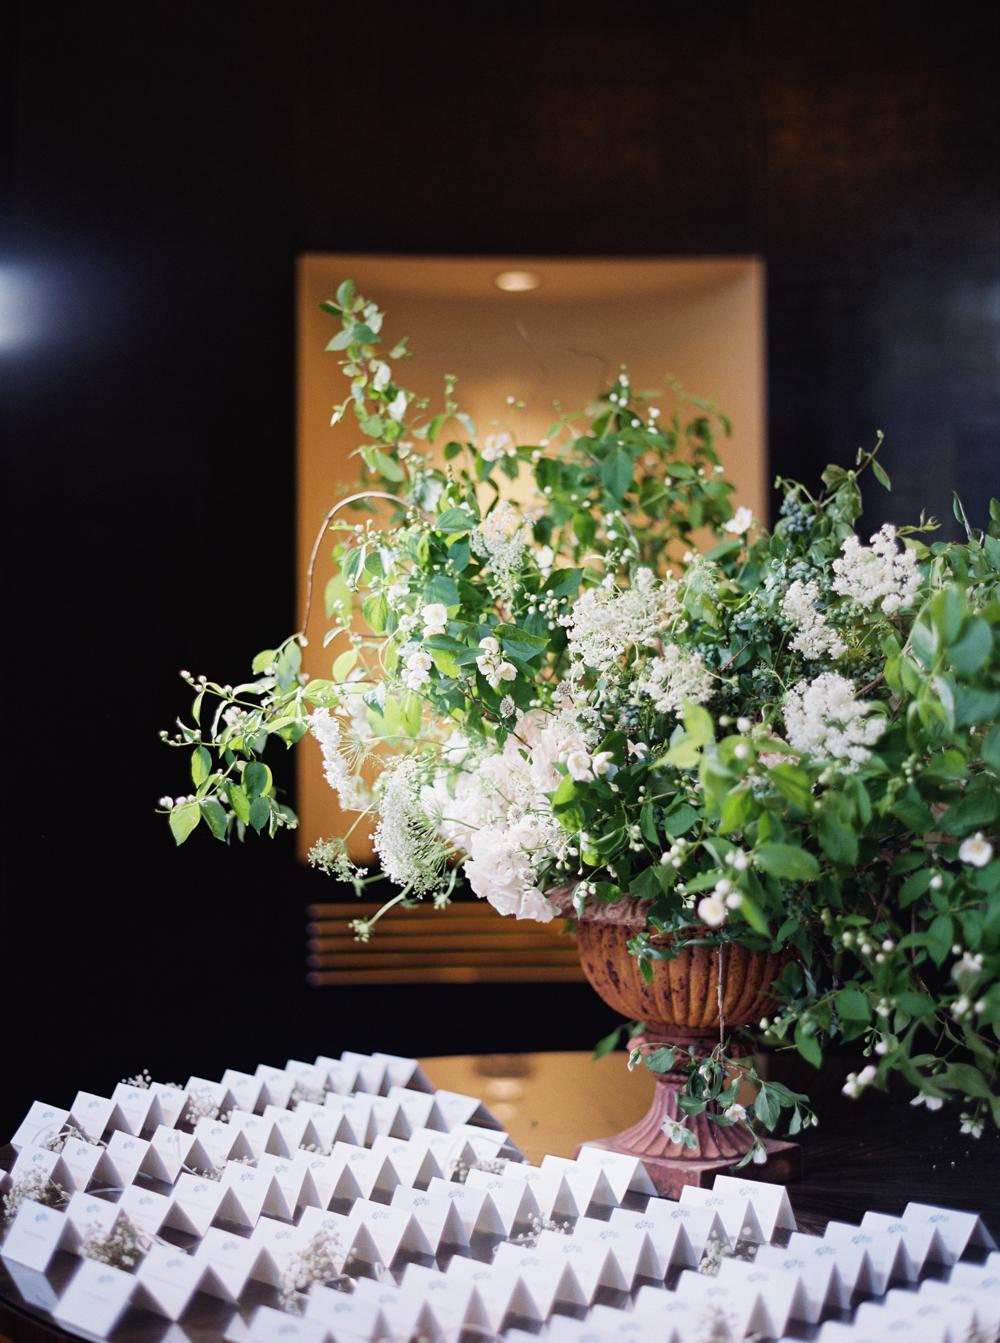 cristina-lozito-photography-flowers-39.jpg